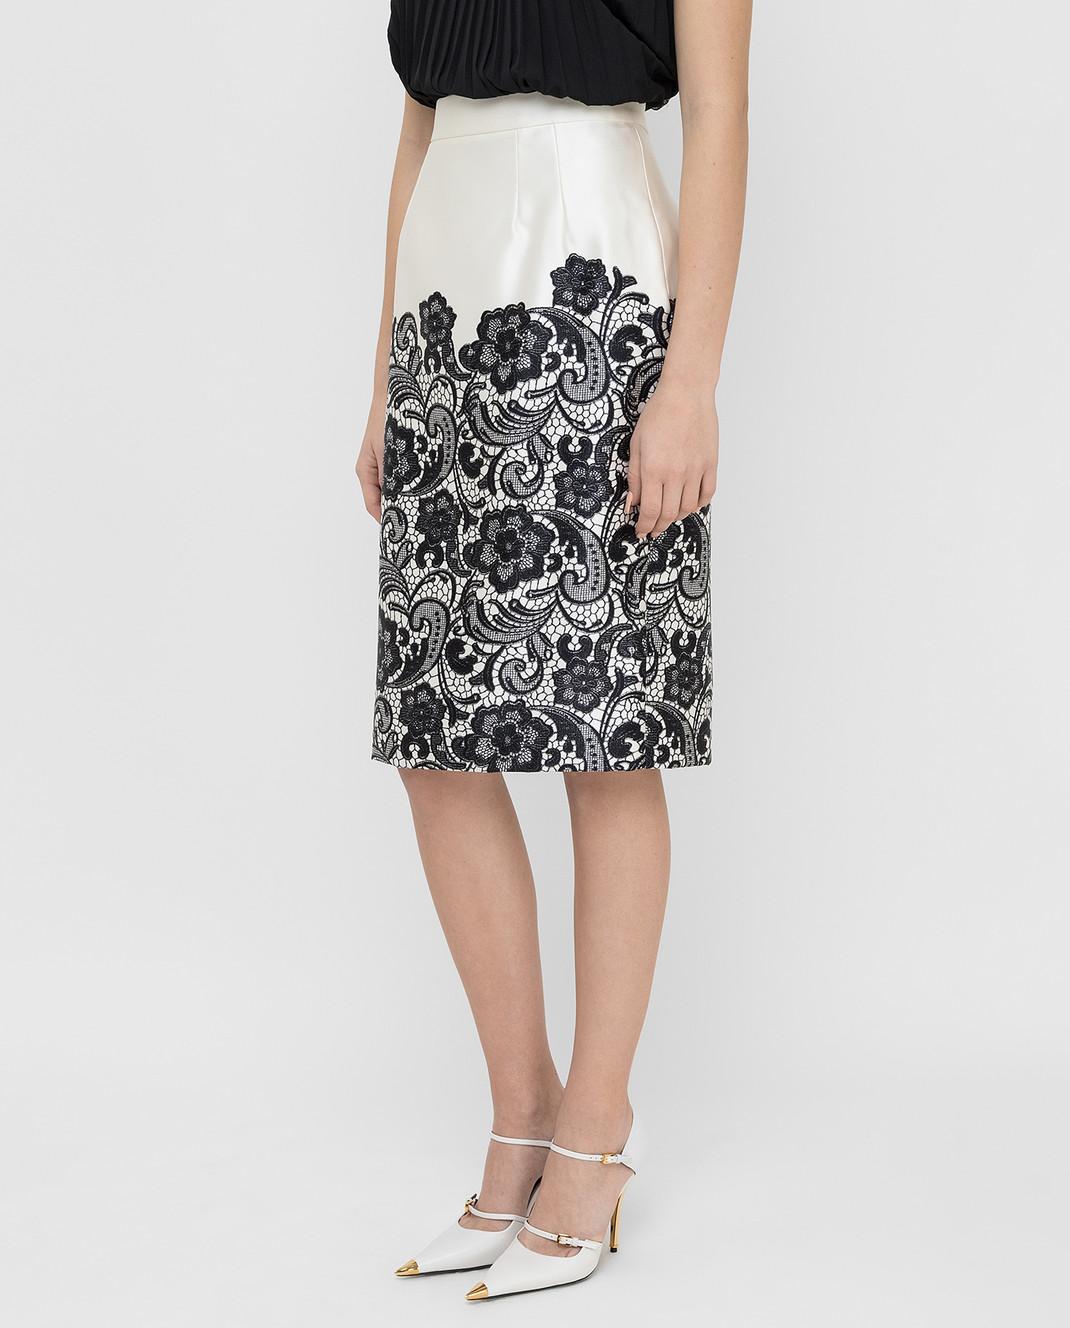 Dolce&Gabbana Светло-бежевая юбка из шелка F4T32TFS1YX изображение 3